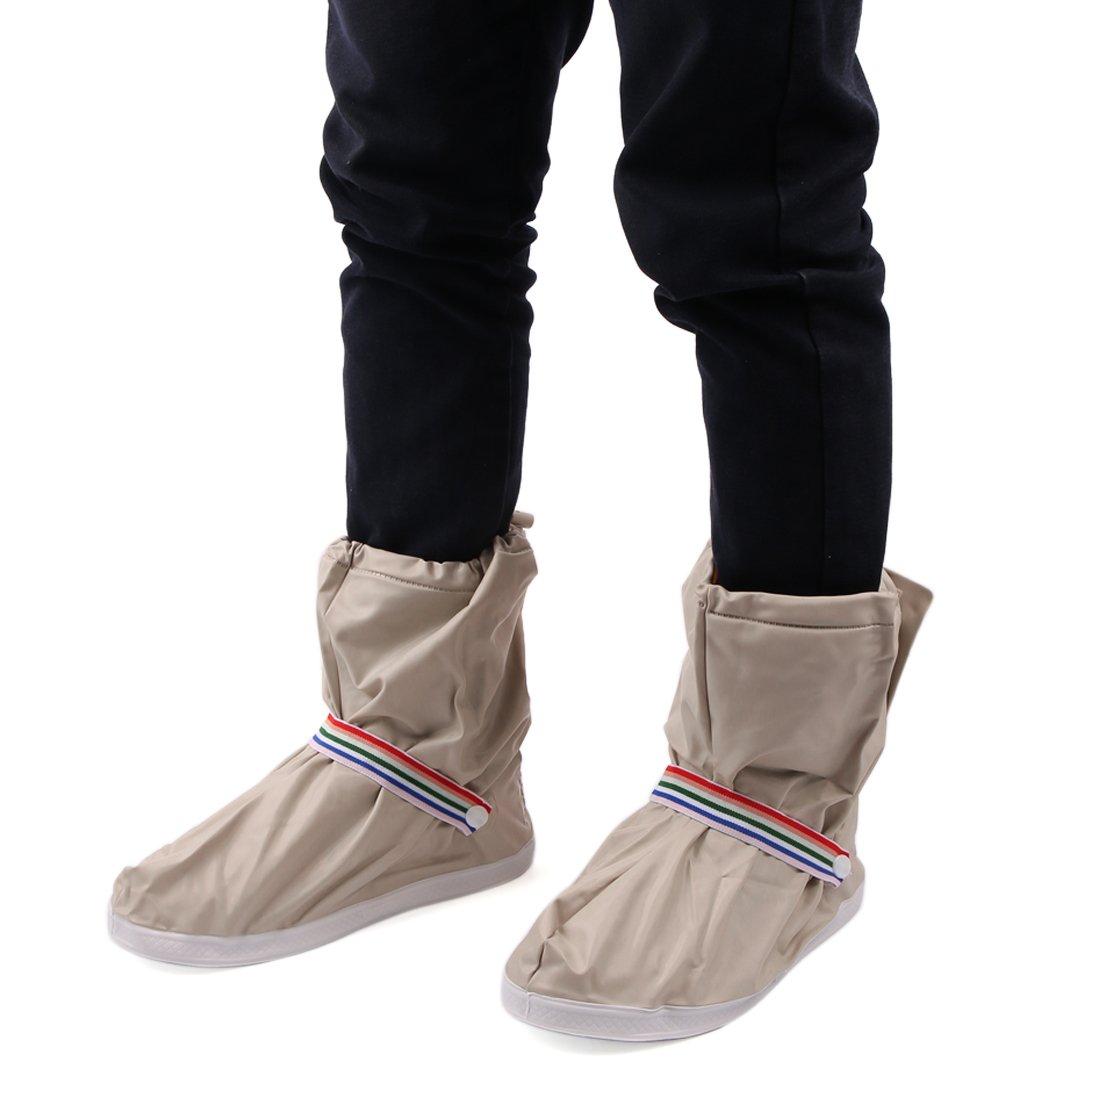 uxcell 1Pair Beige Motorcycle Anti-Slip Waterproof Adjustable Rain Shoes Boot Cover L